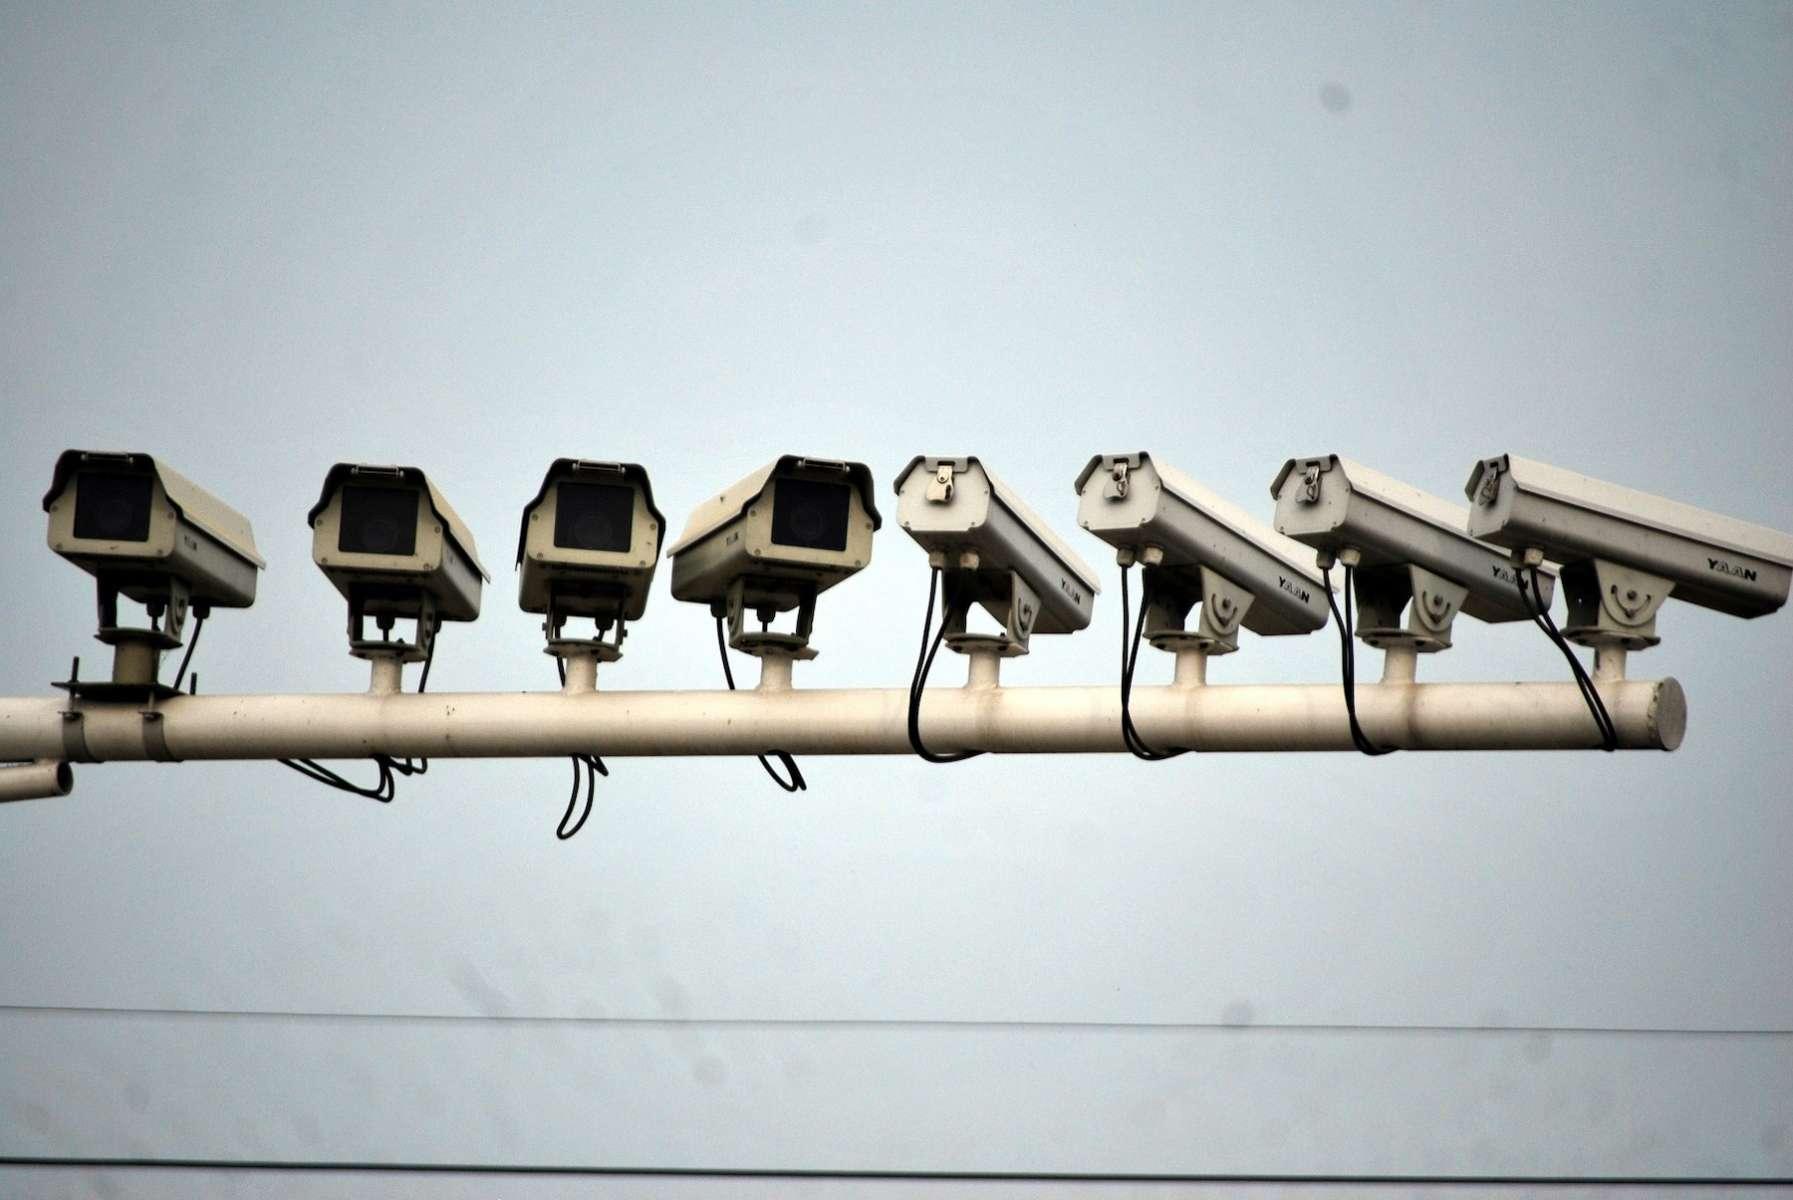 Chicago Traffic Cameras